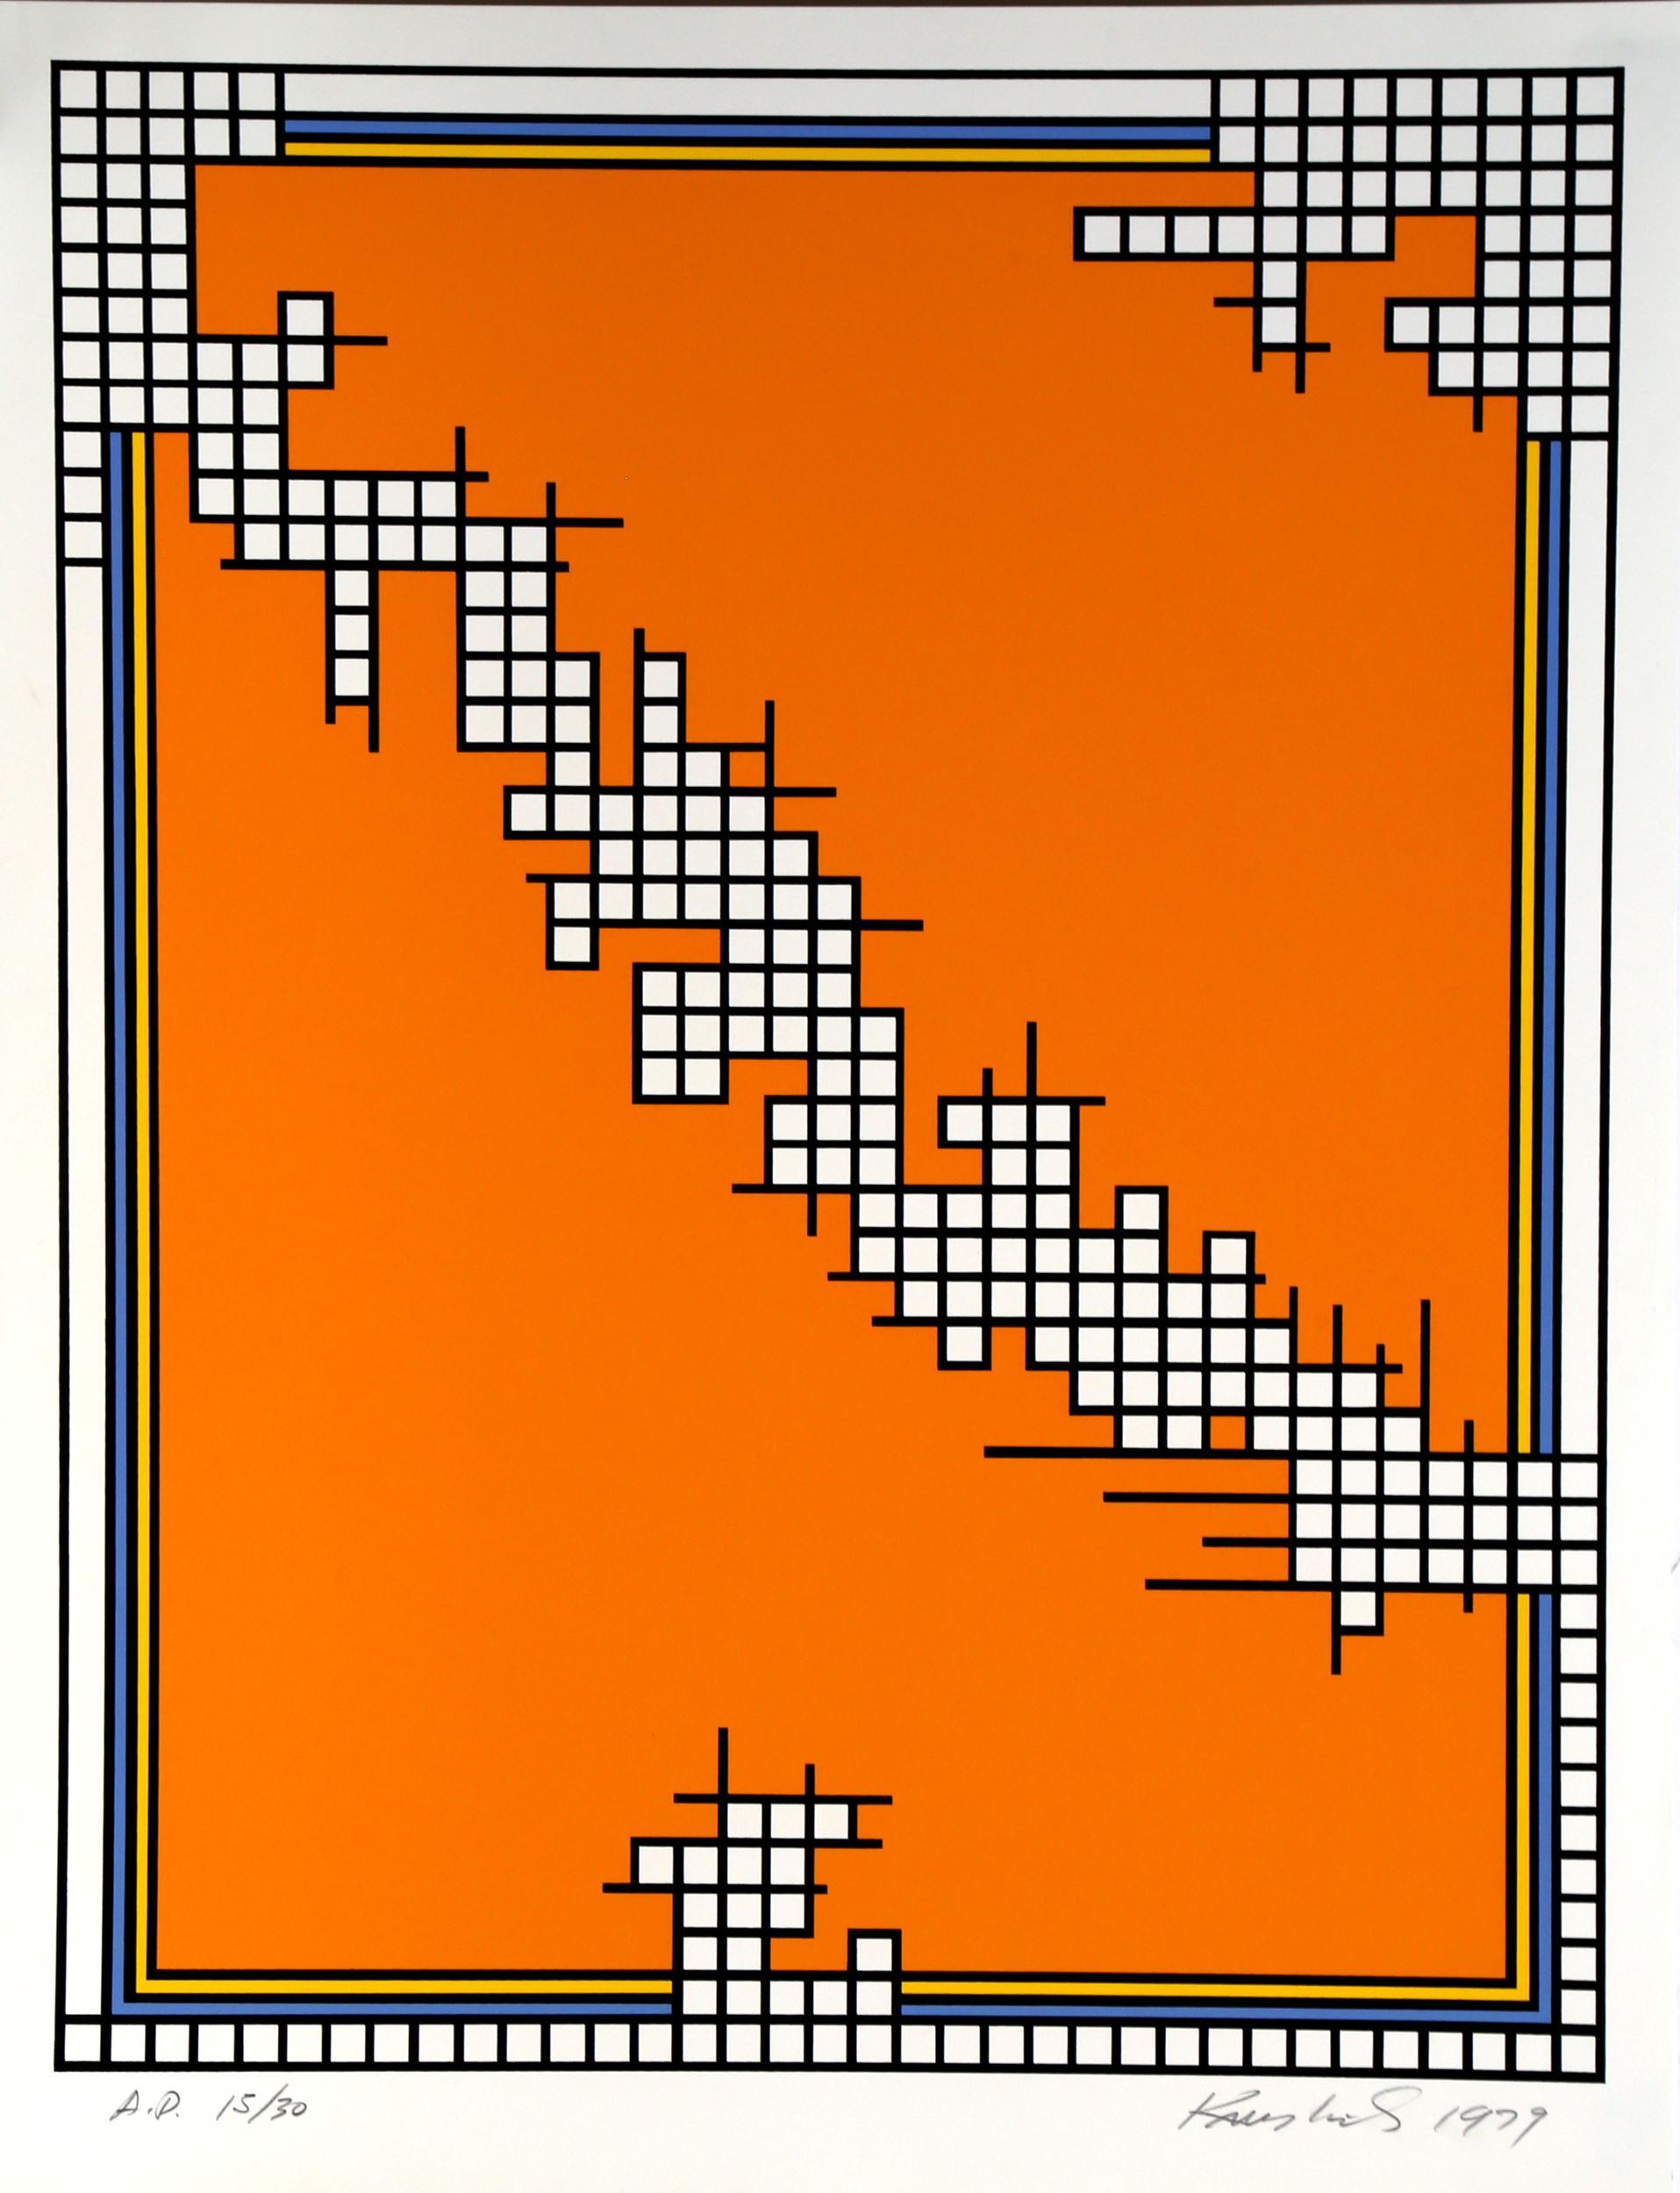 Nicholas Krushenick, Untitled (Wire Mill Variant), Serigraph